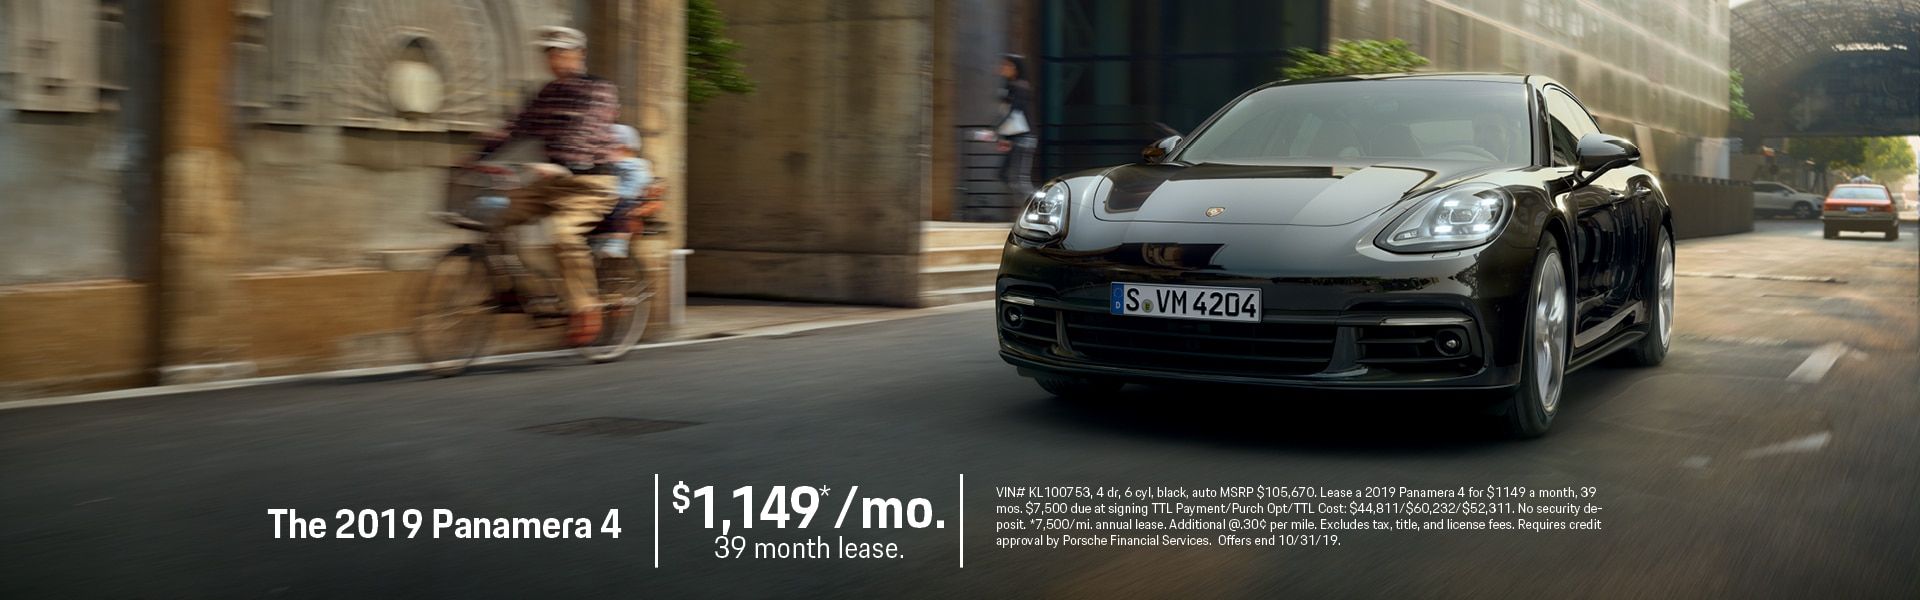 Porsche Panamera Lease >> Porsche Car Dealership Cherry Hill Nj Philadelphia